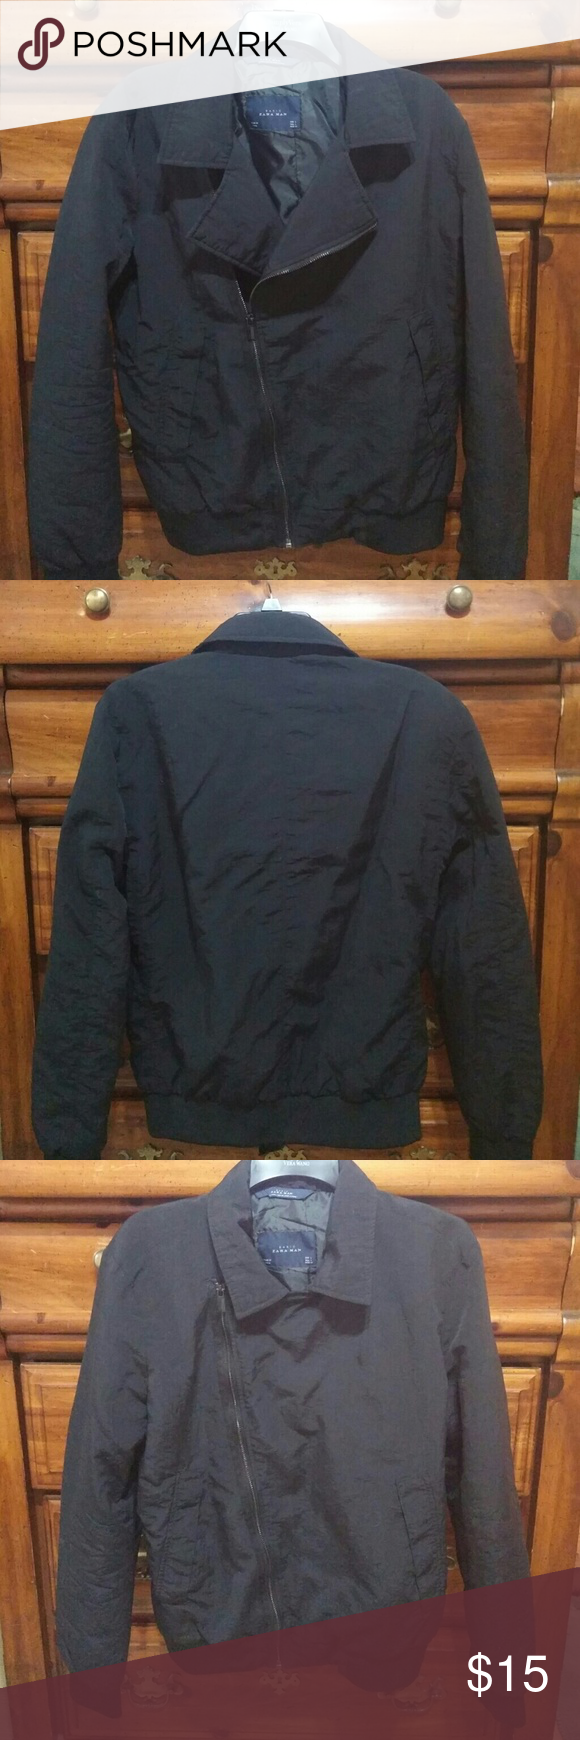 "Zara Man Black Oversized Jacket sz L Beautiful comfy oversized Zara Man Black Jacket. In clean like new condition. Has side pockets with one inside pocket. Pit to Pit 22"", Length About 26"", Zipper Length 22"". Zara Jackets & Coats Utility Jackets"